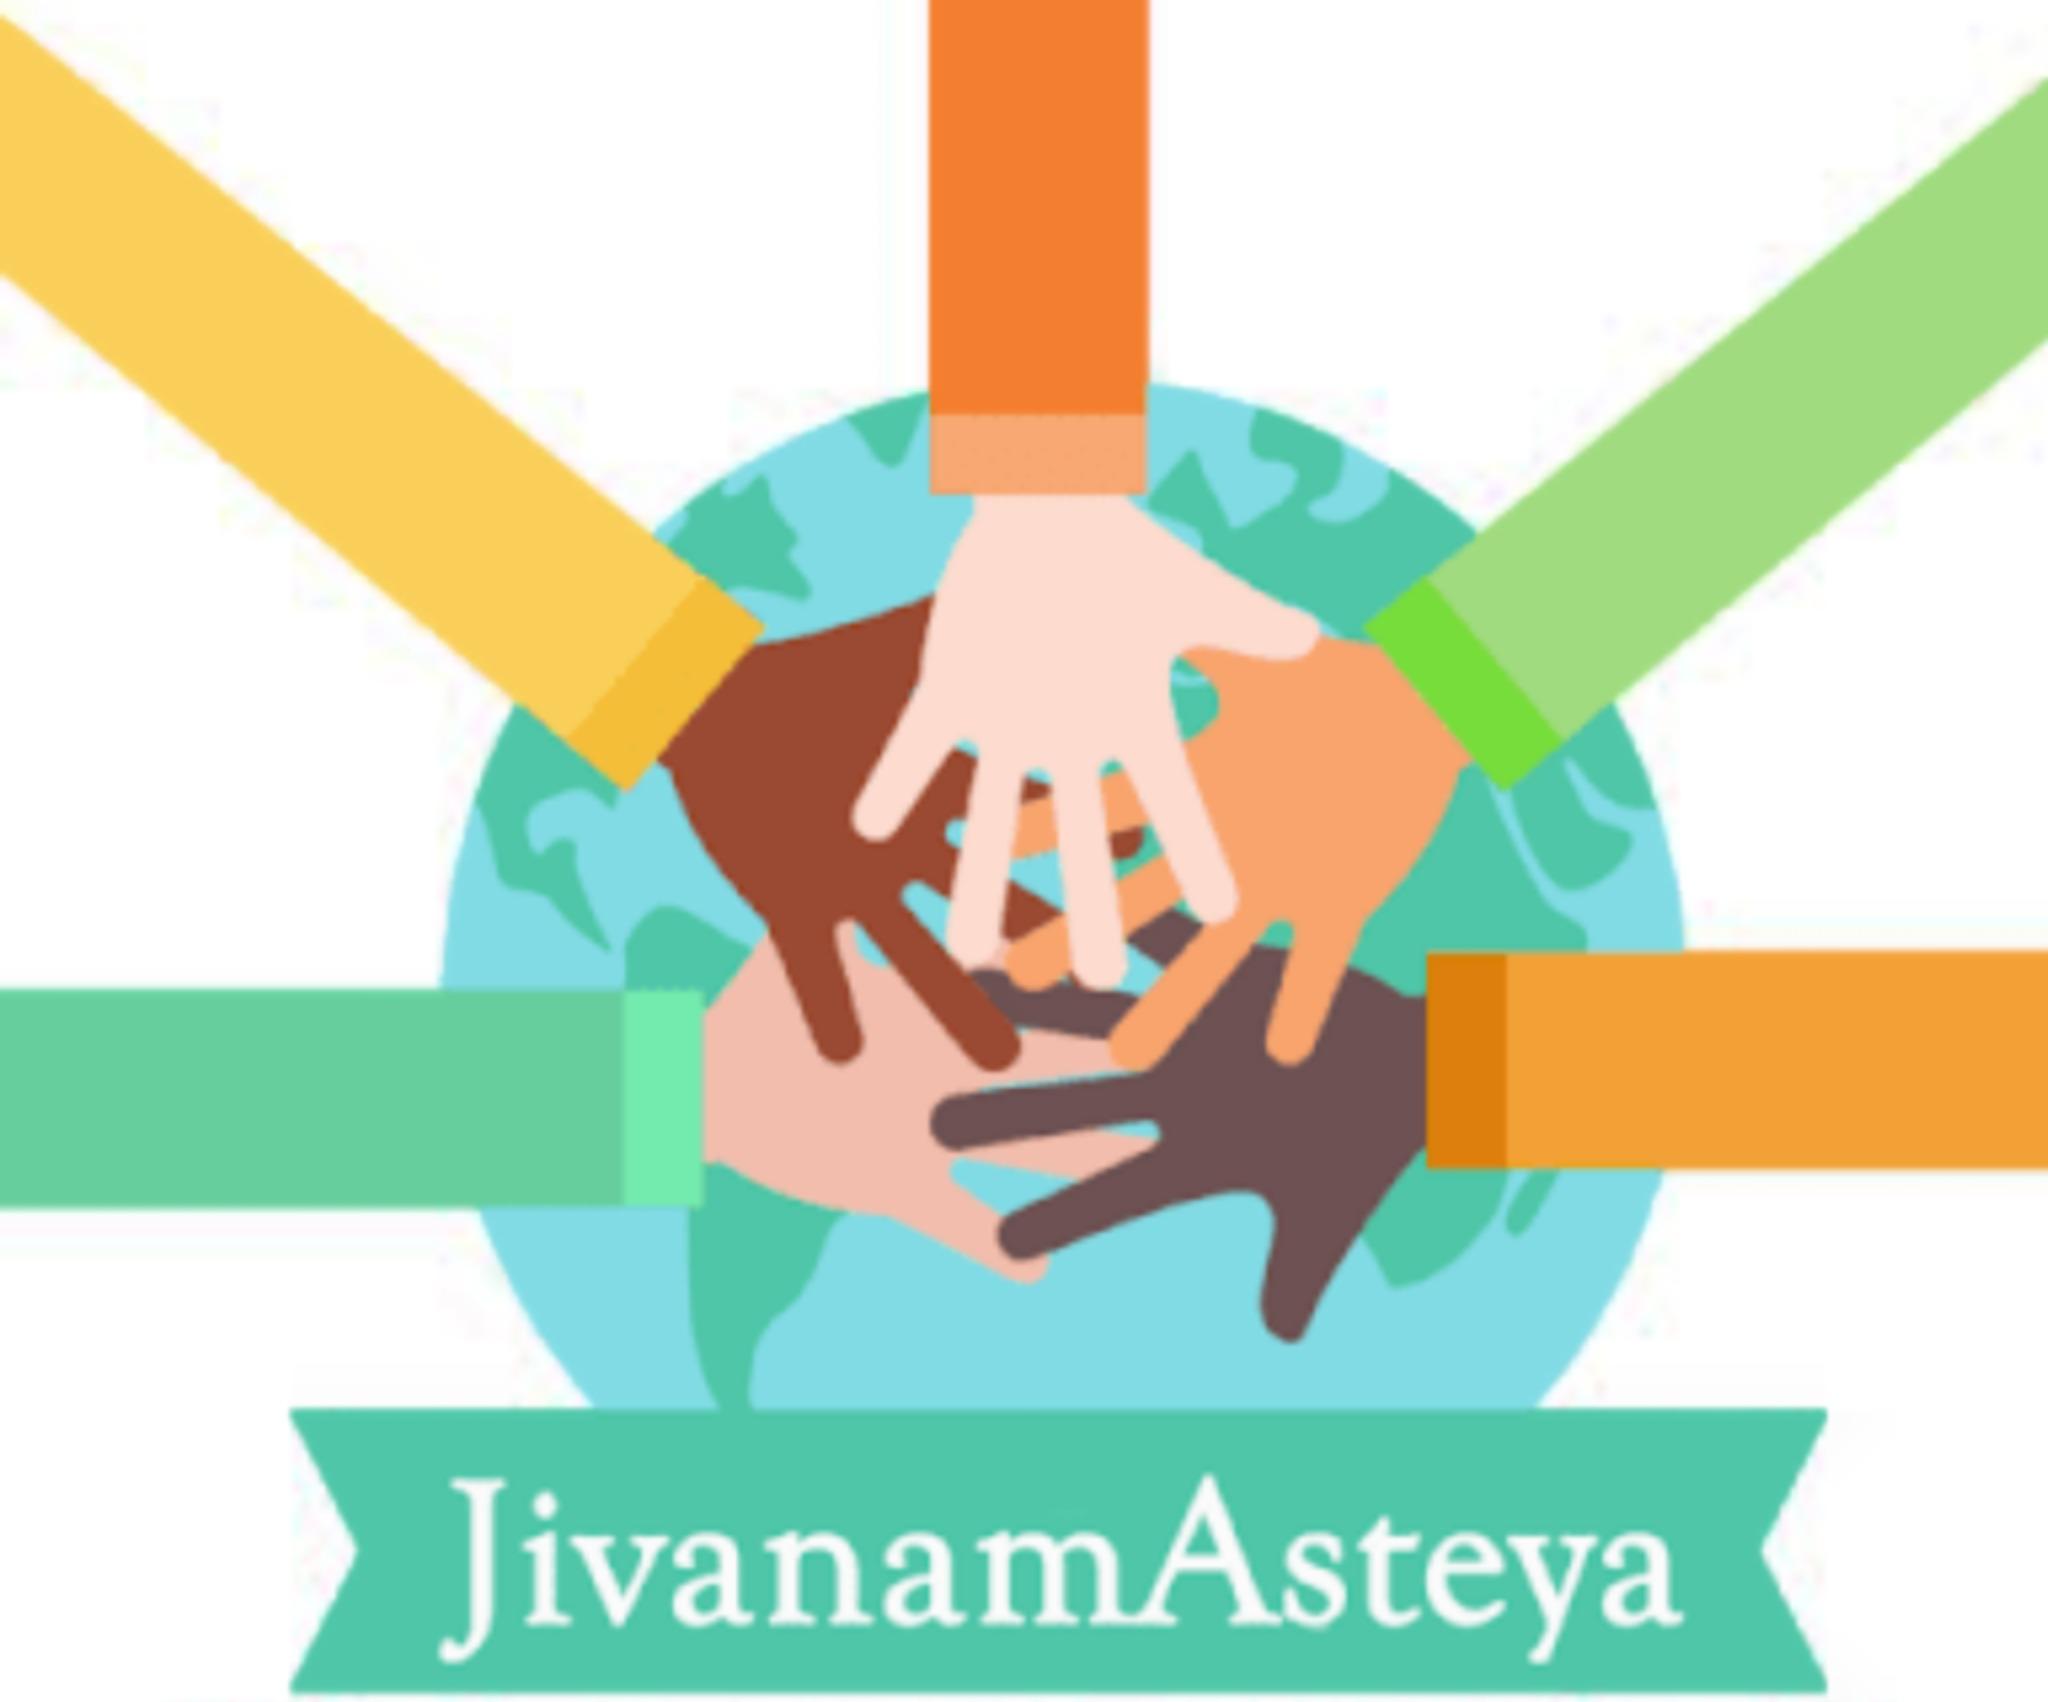 JivanamAsteya